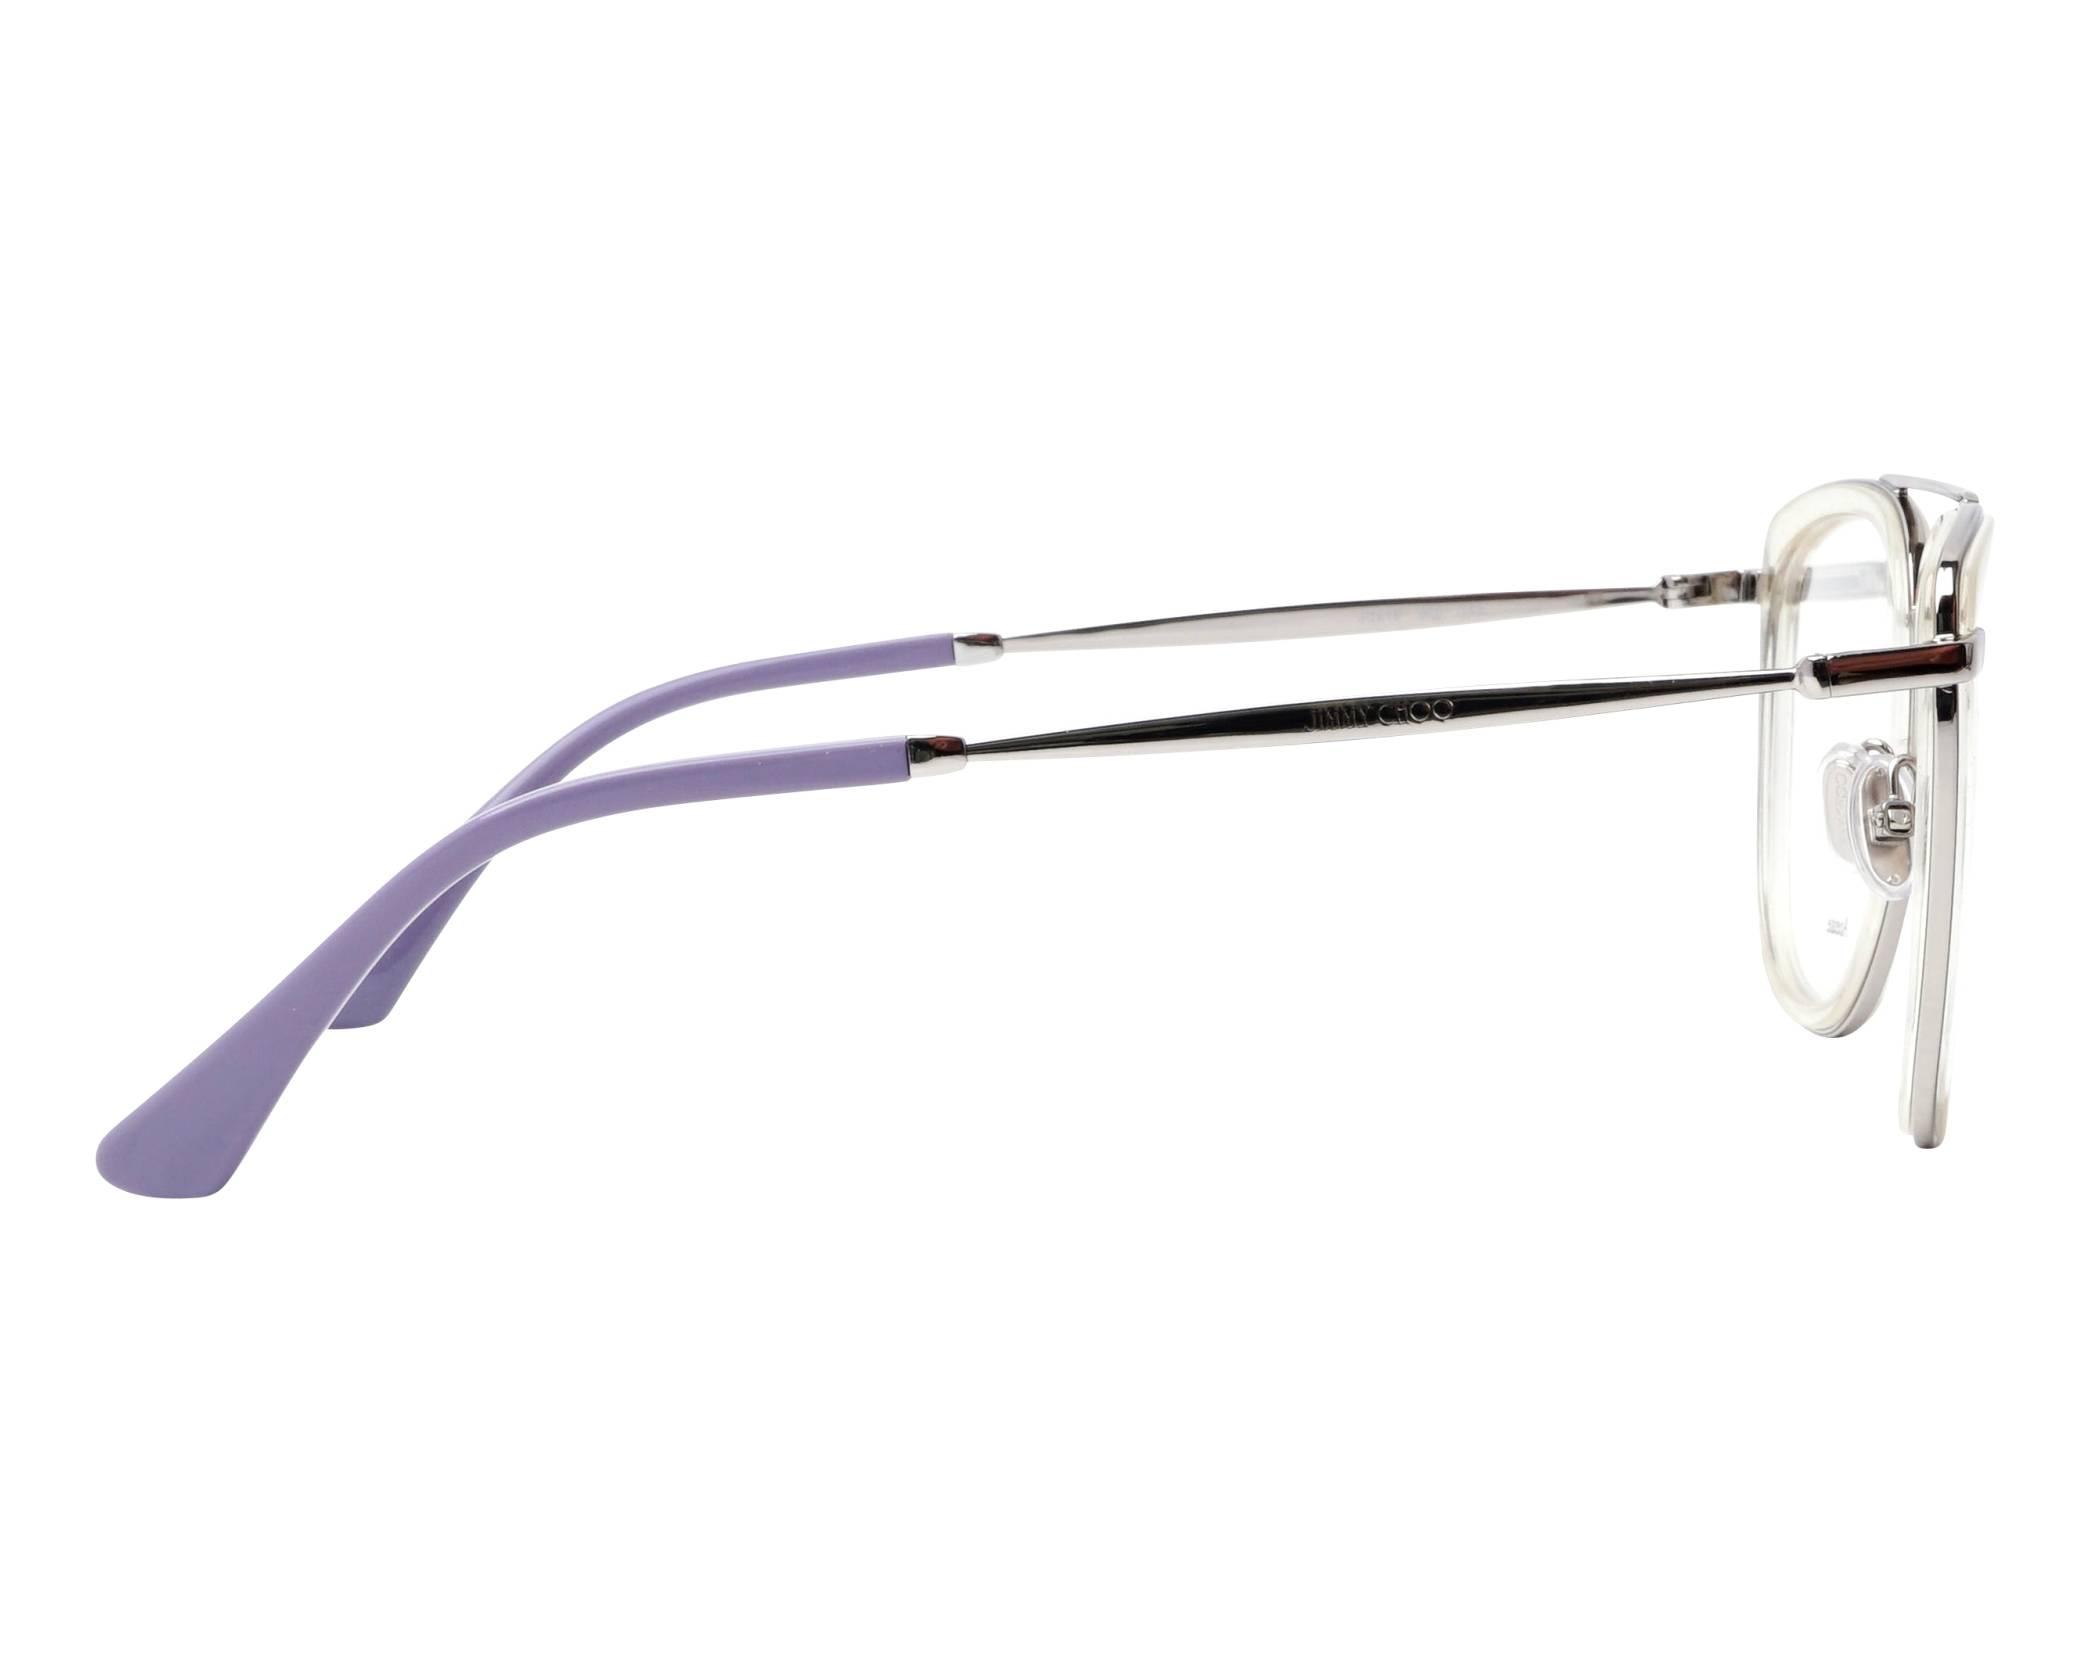 5478c0de6eb7 eyeglasses Jimmy Choo JC-219 900 52-20 Crystal Silver side view